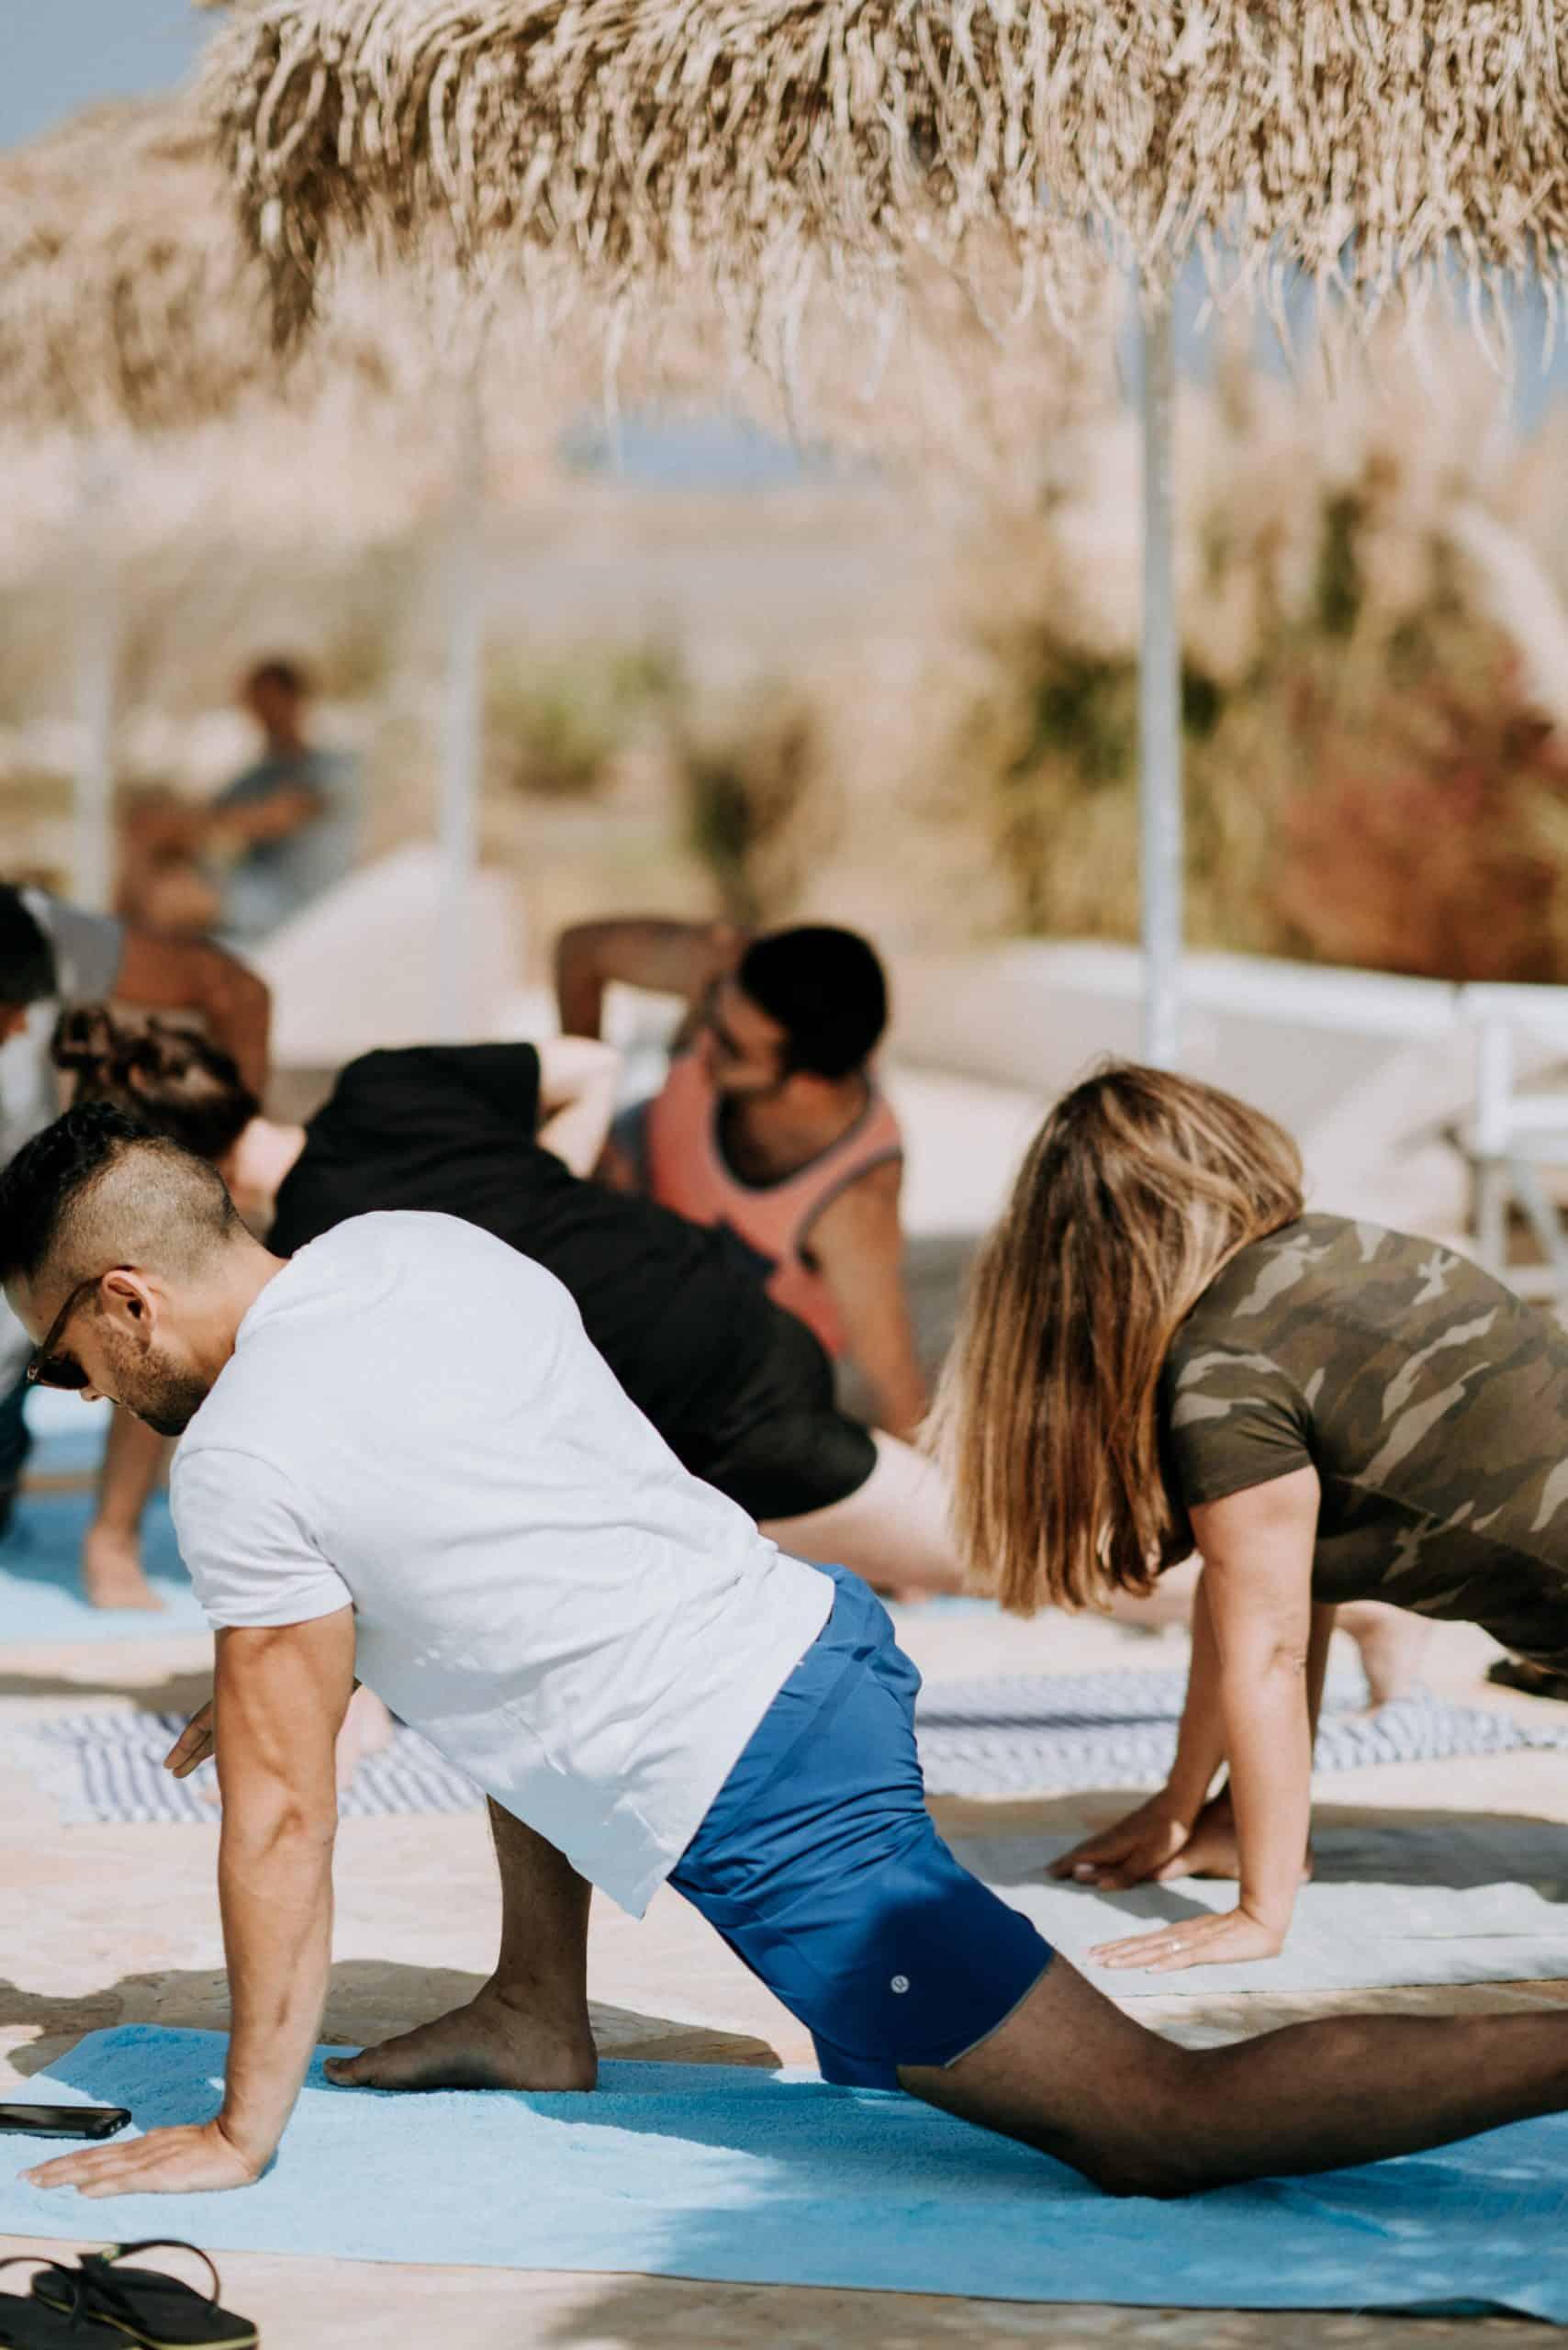 Annie Spratt Unsplash image of Yoga retreat outdoors men and women in asana